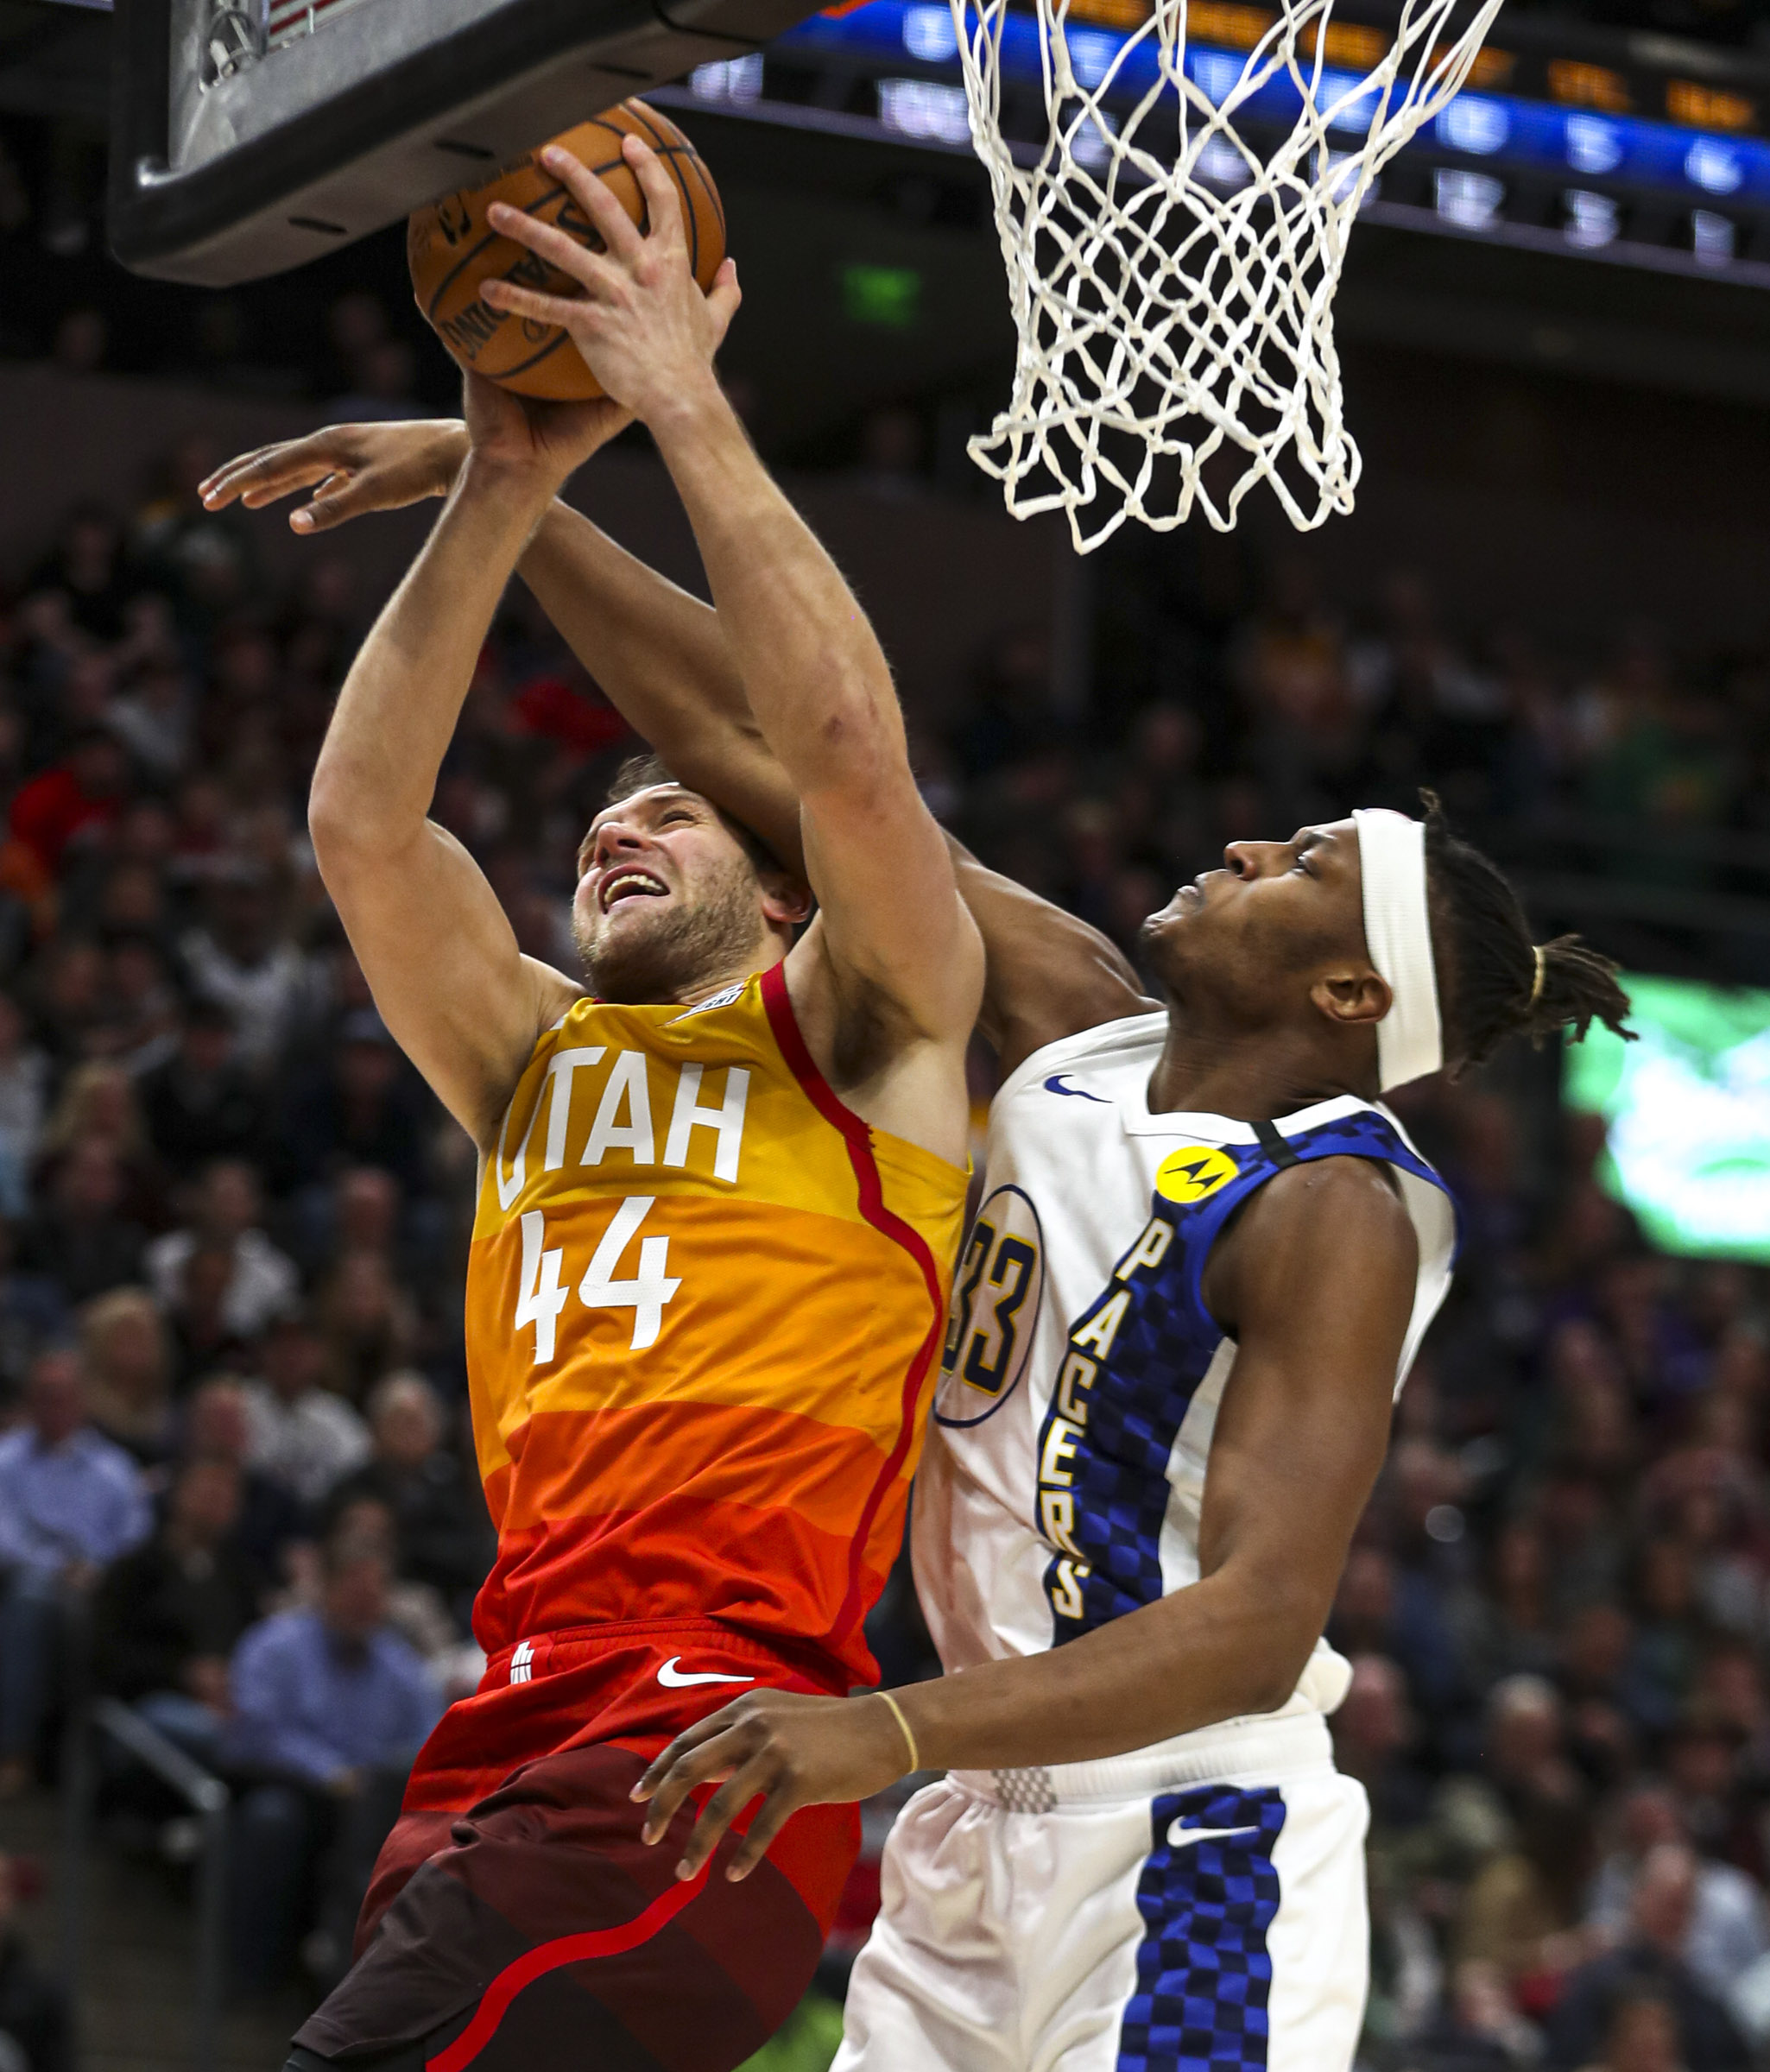 Utah Jazz forward Bojan Bogdanovic (44) gets fouled by Indiana Pacers center Myles Turner (33) during an NBA basketball game at Vivint Arena in Salt Lake City on Monday, Jan. 20, 2020.